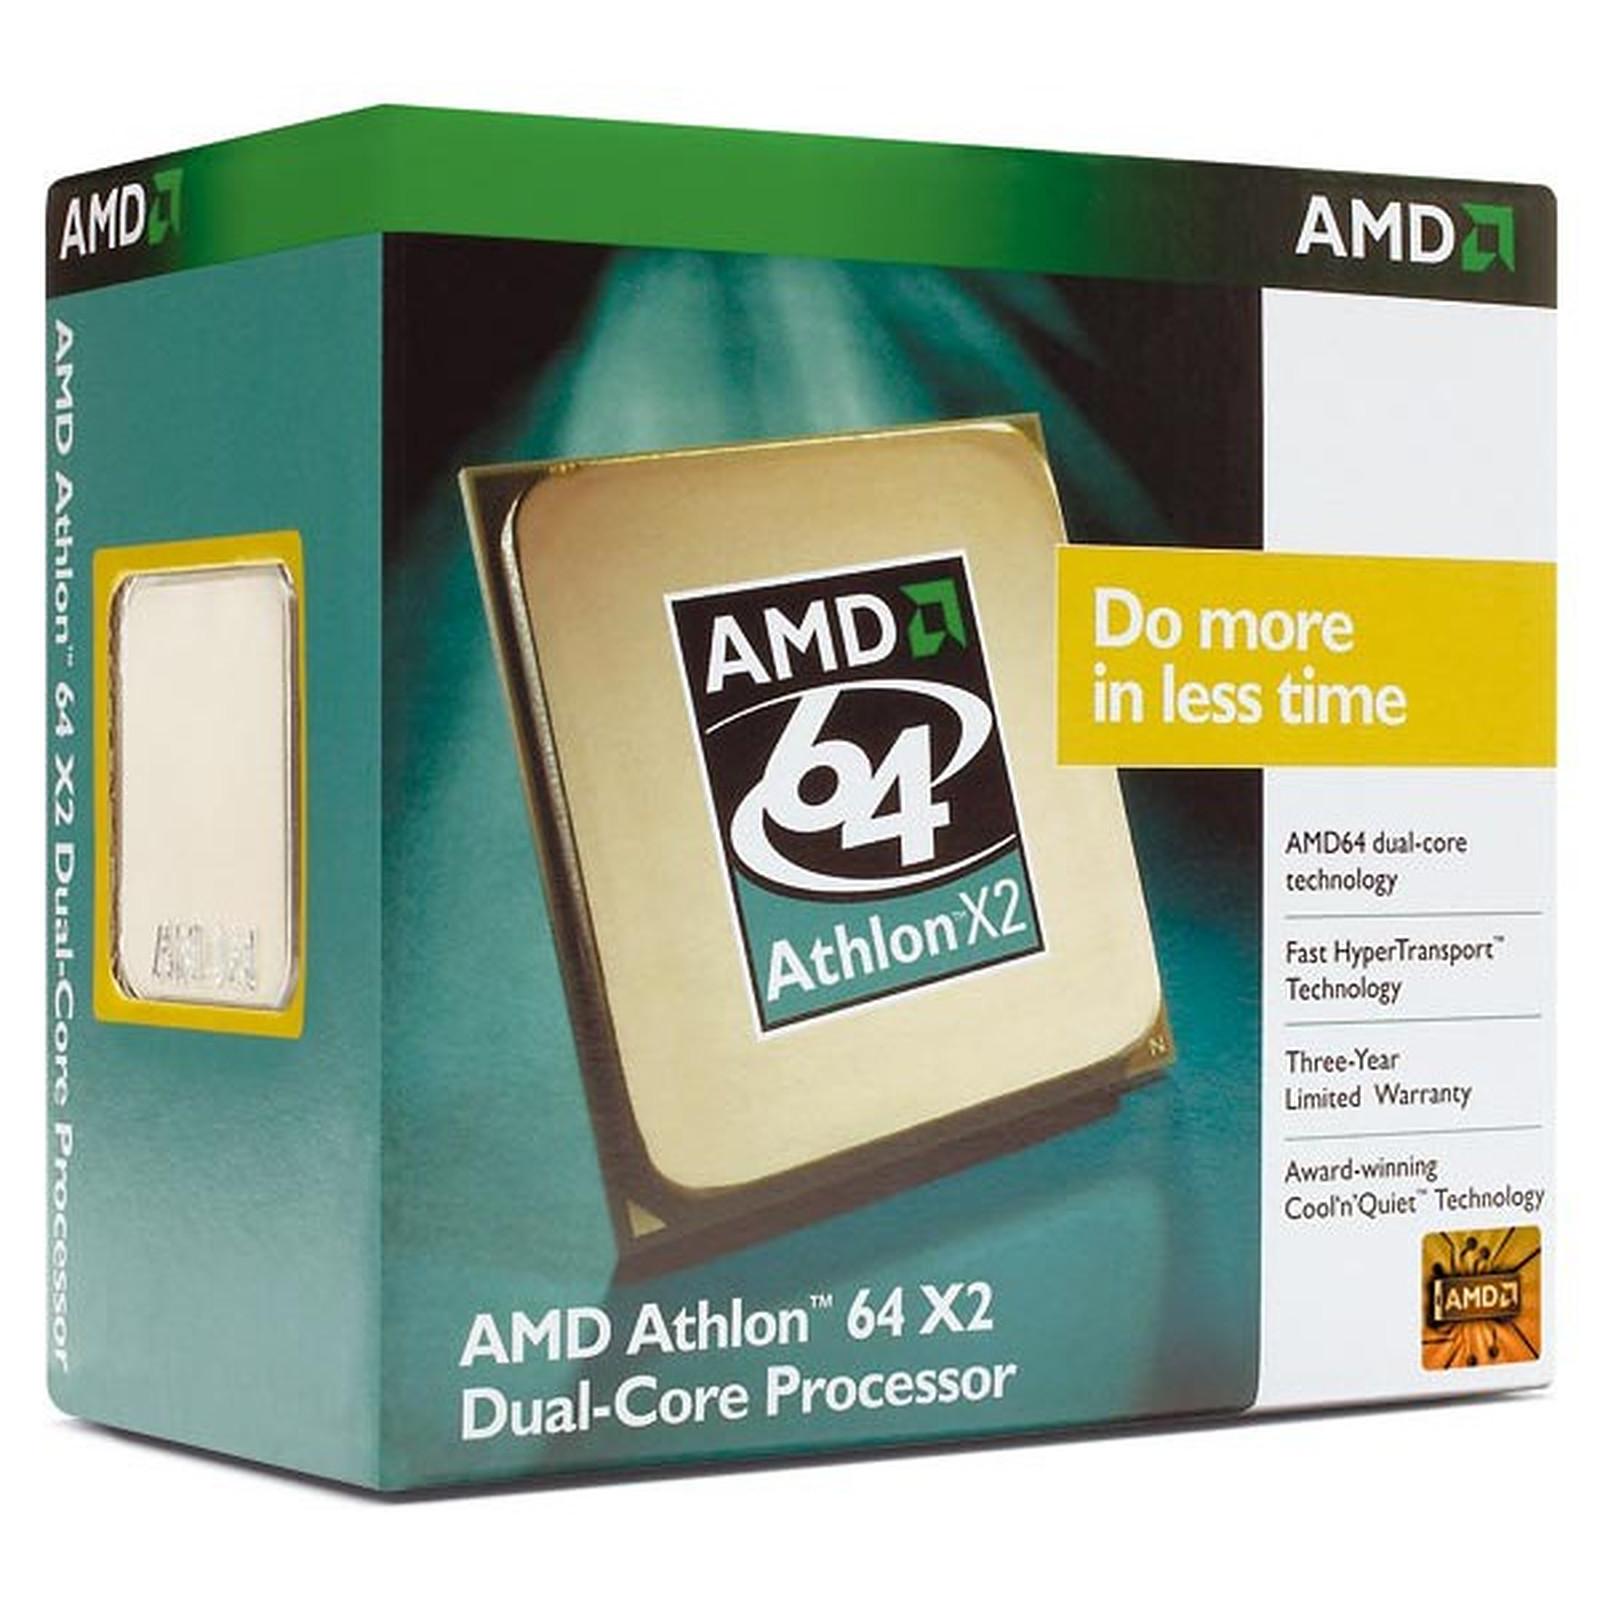 AMD Athlon 64 X2 Dual-Core 4600+